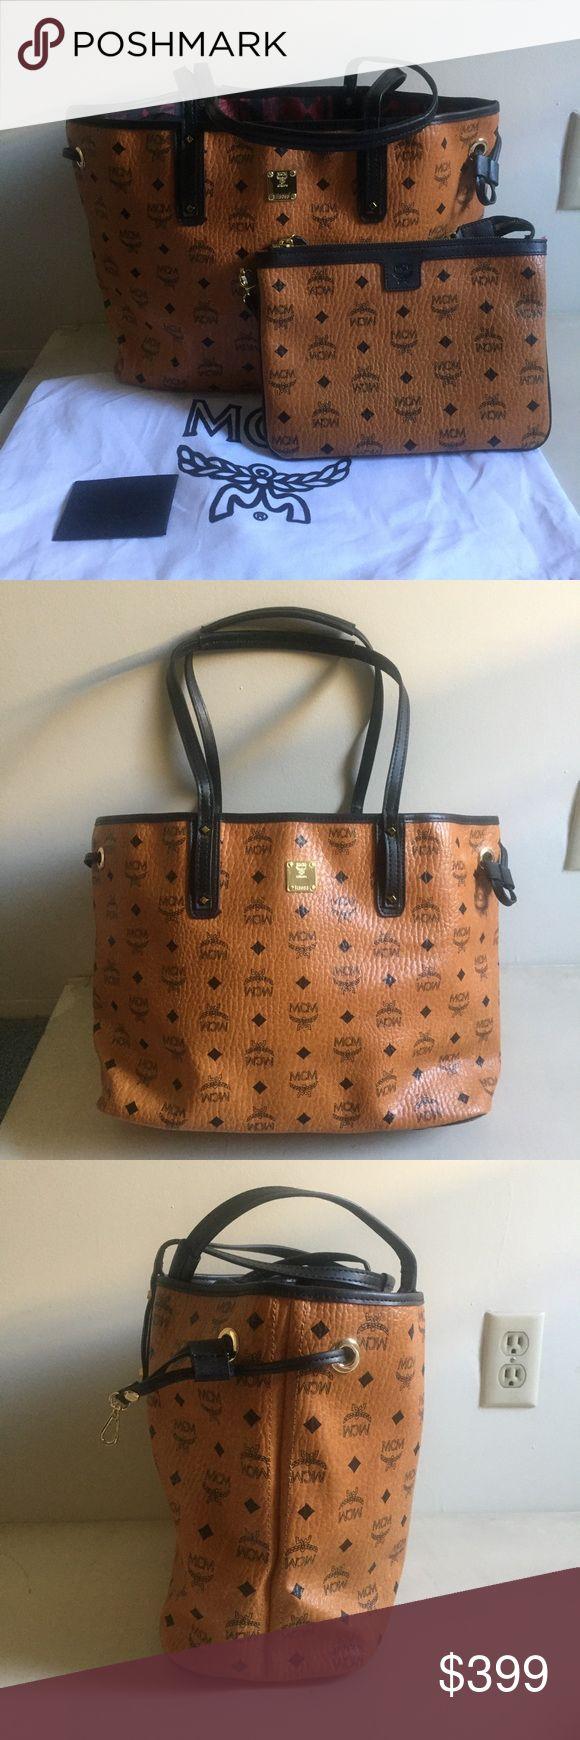 MCM Handbag Tote Brown Purse Never used, 100% authentic MCM reversible tote. MCM Bags Totes